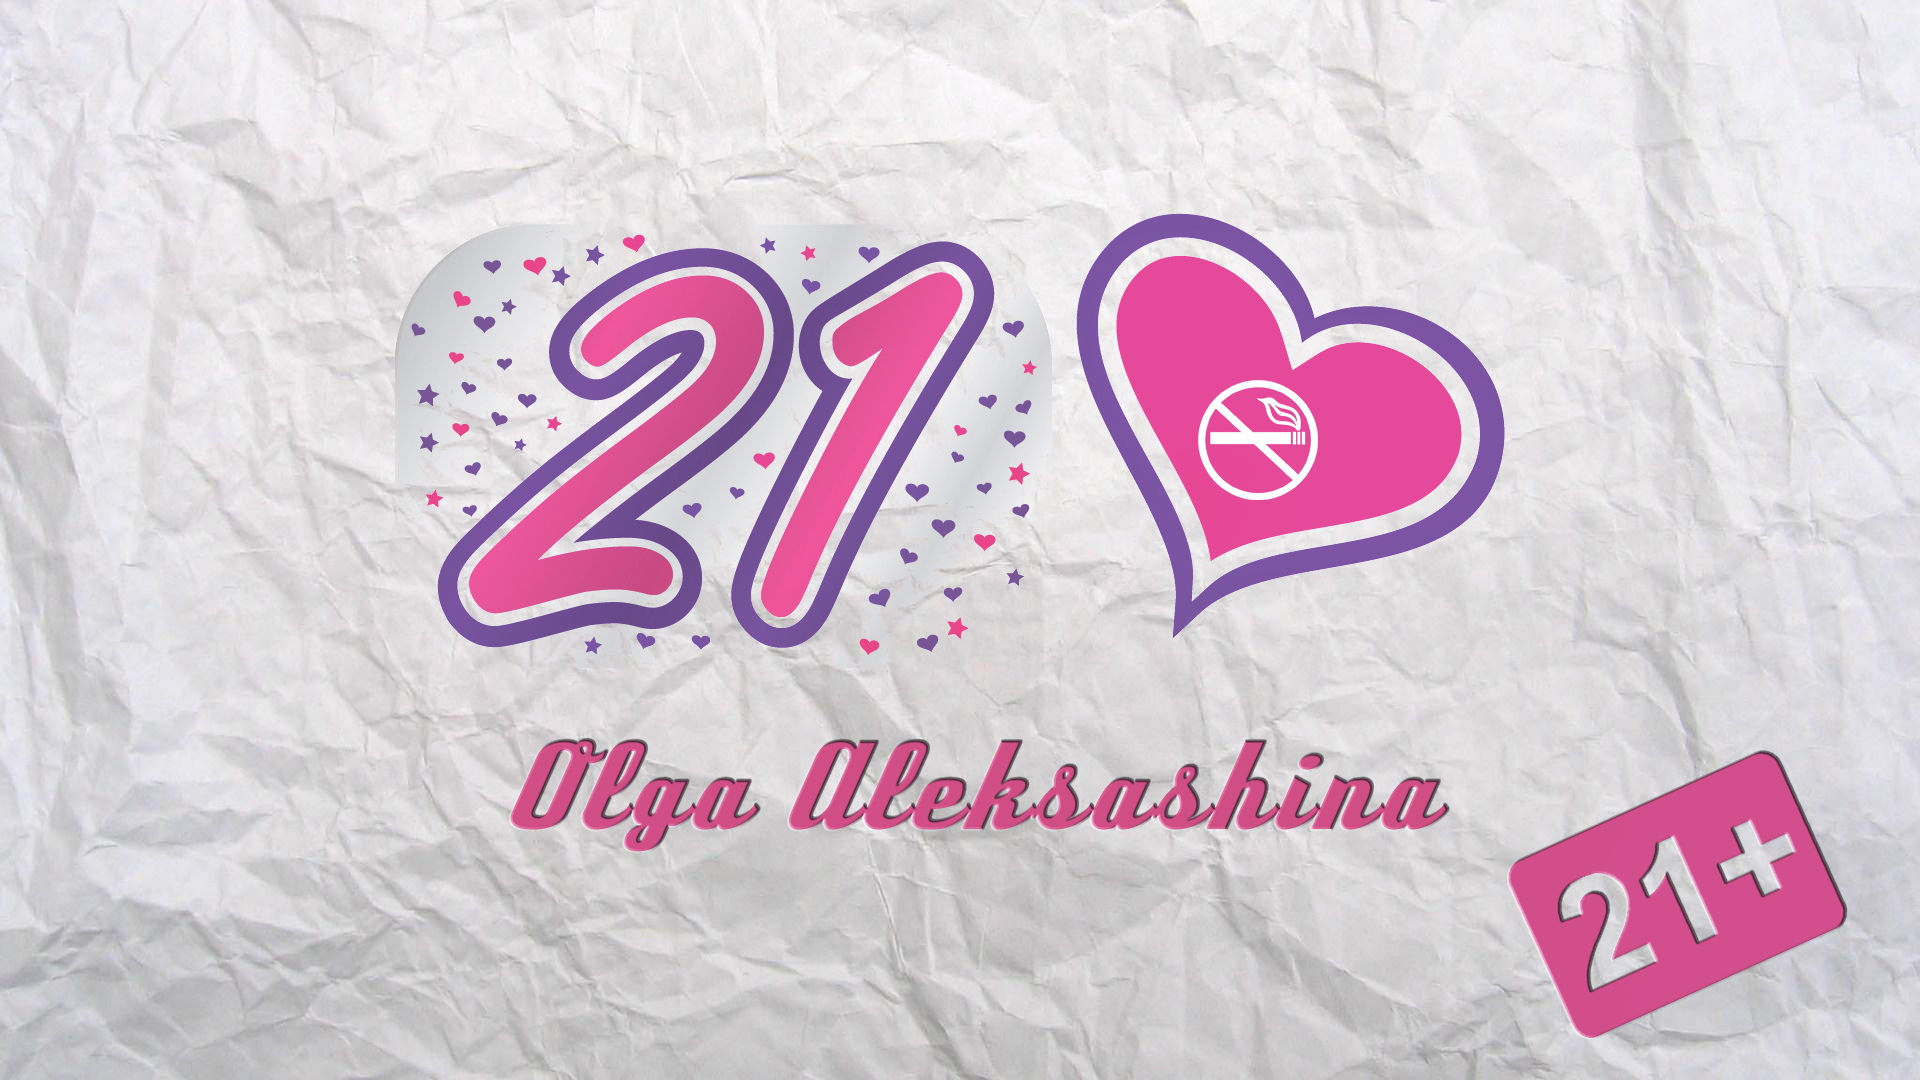 olga-aleksashina21-jpg.271255